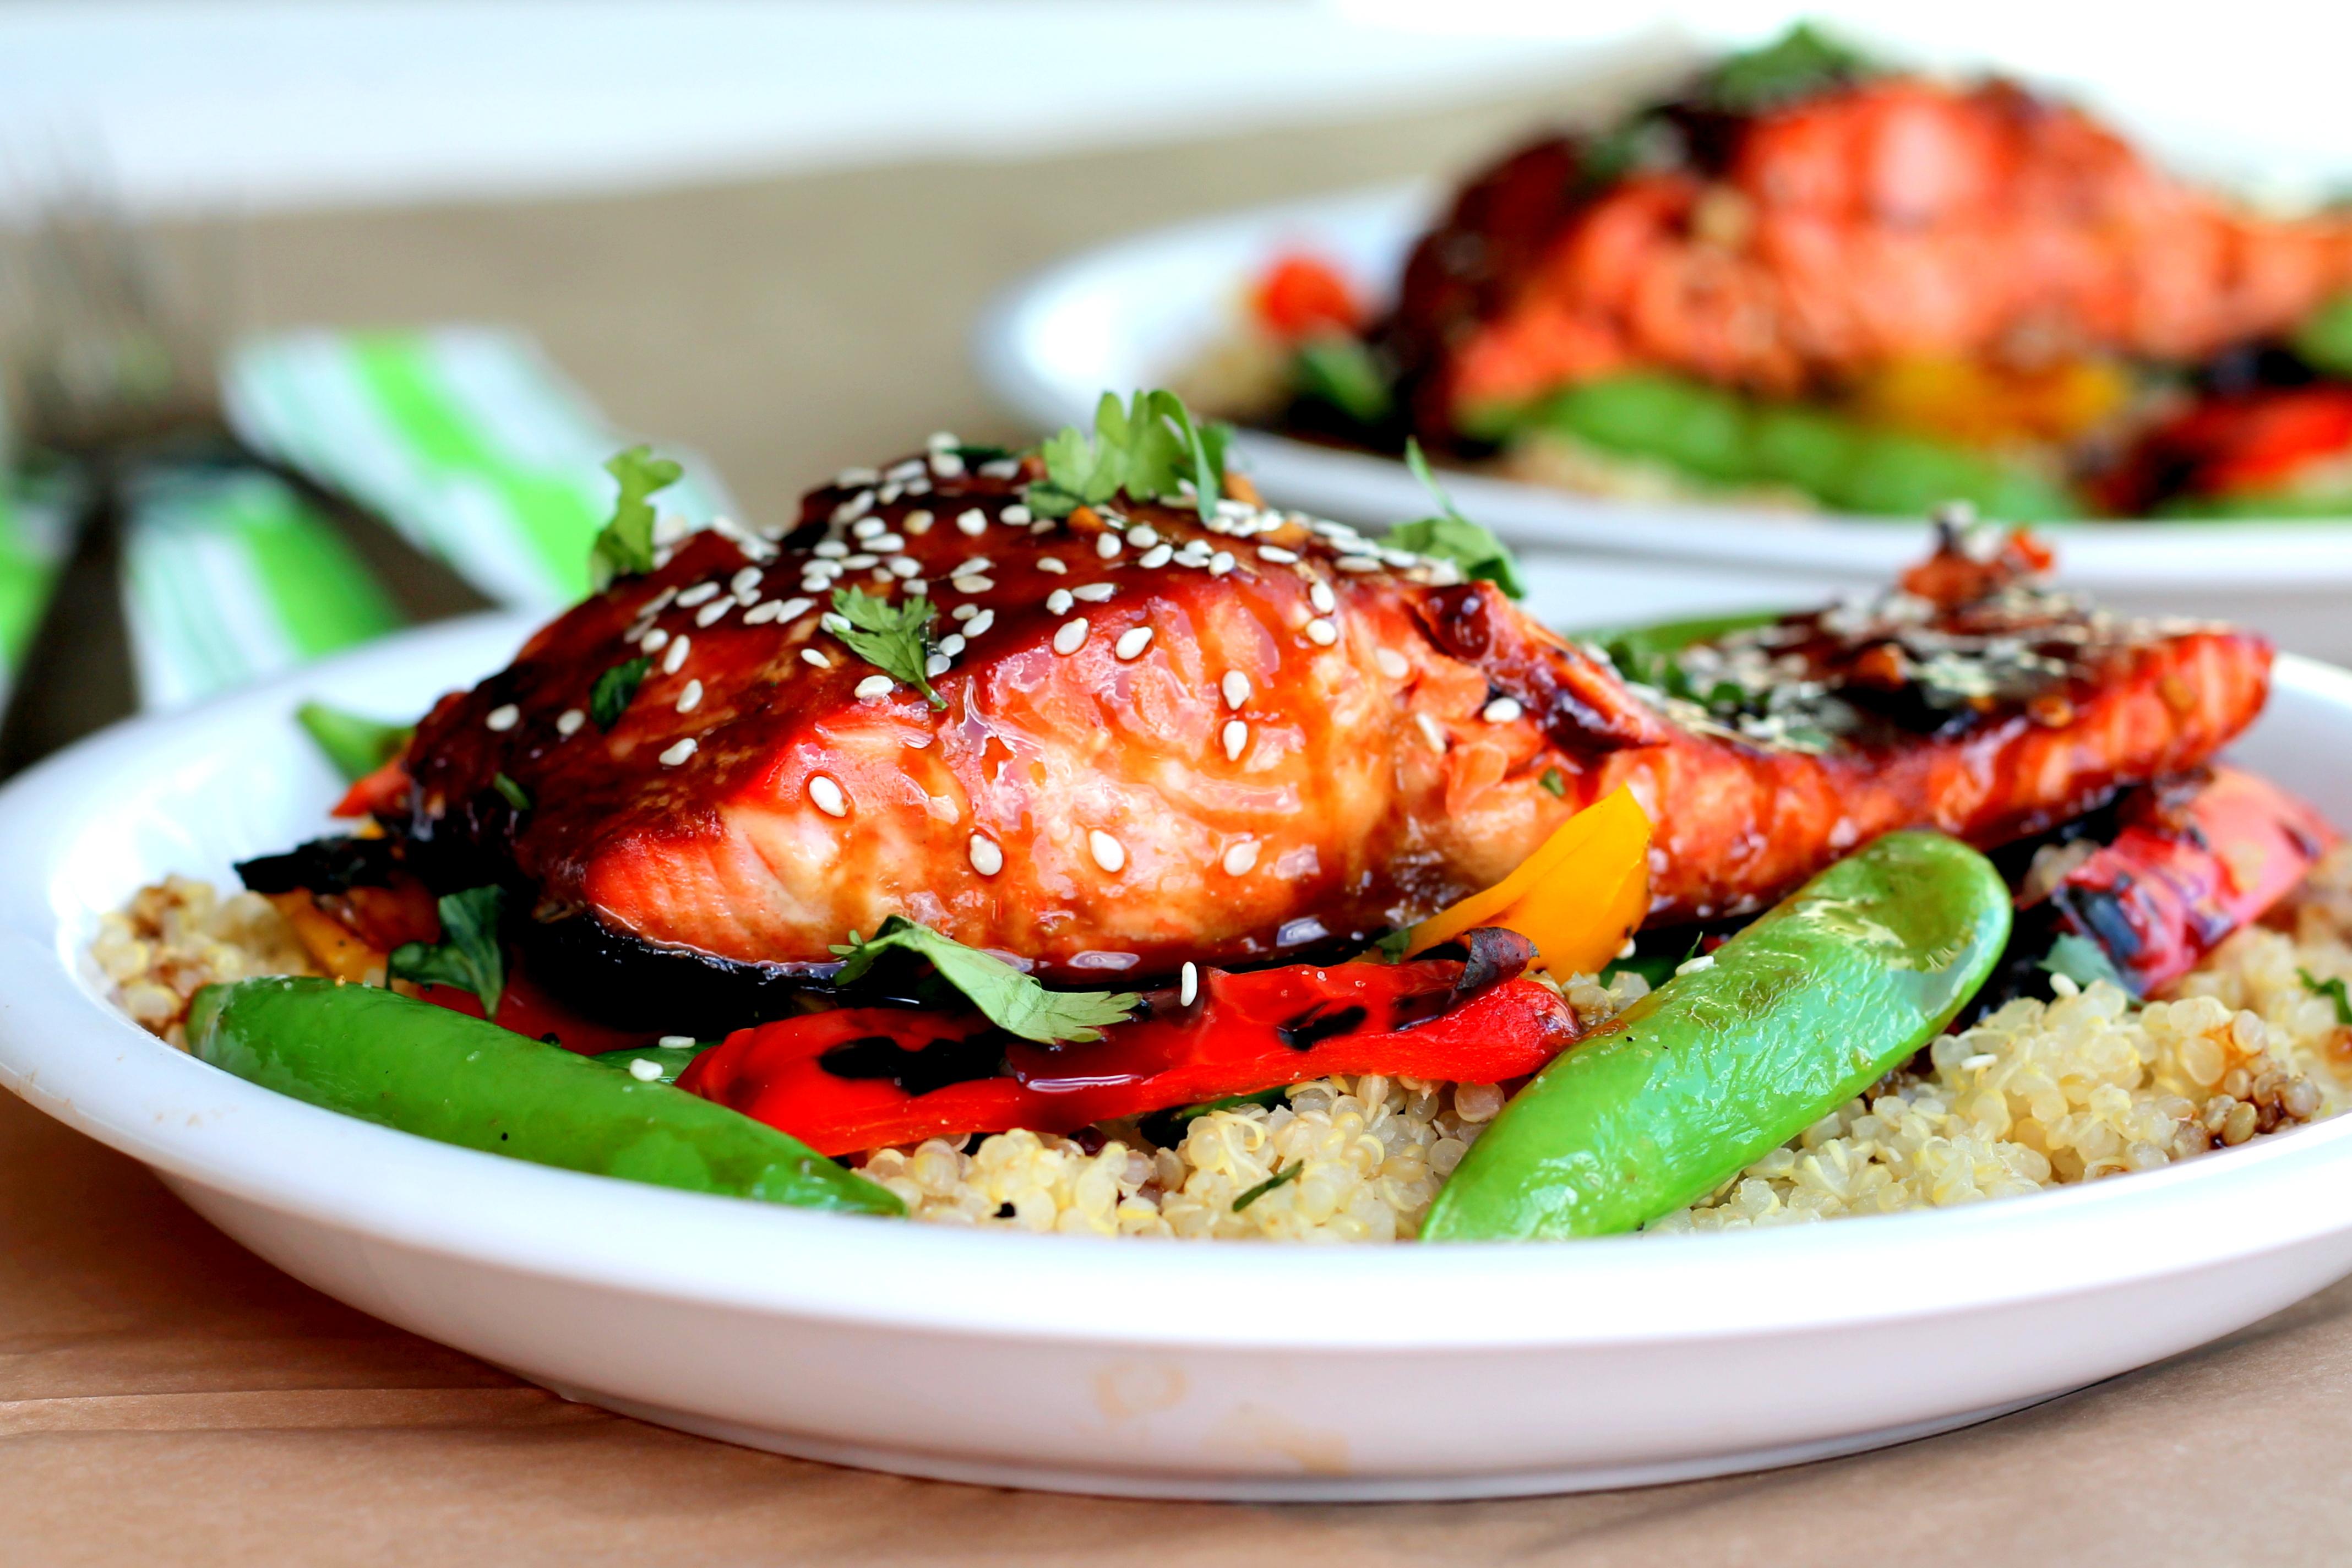 Sesame Ginger Teriyaki Salmon With Quinoa Stir Fry